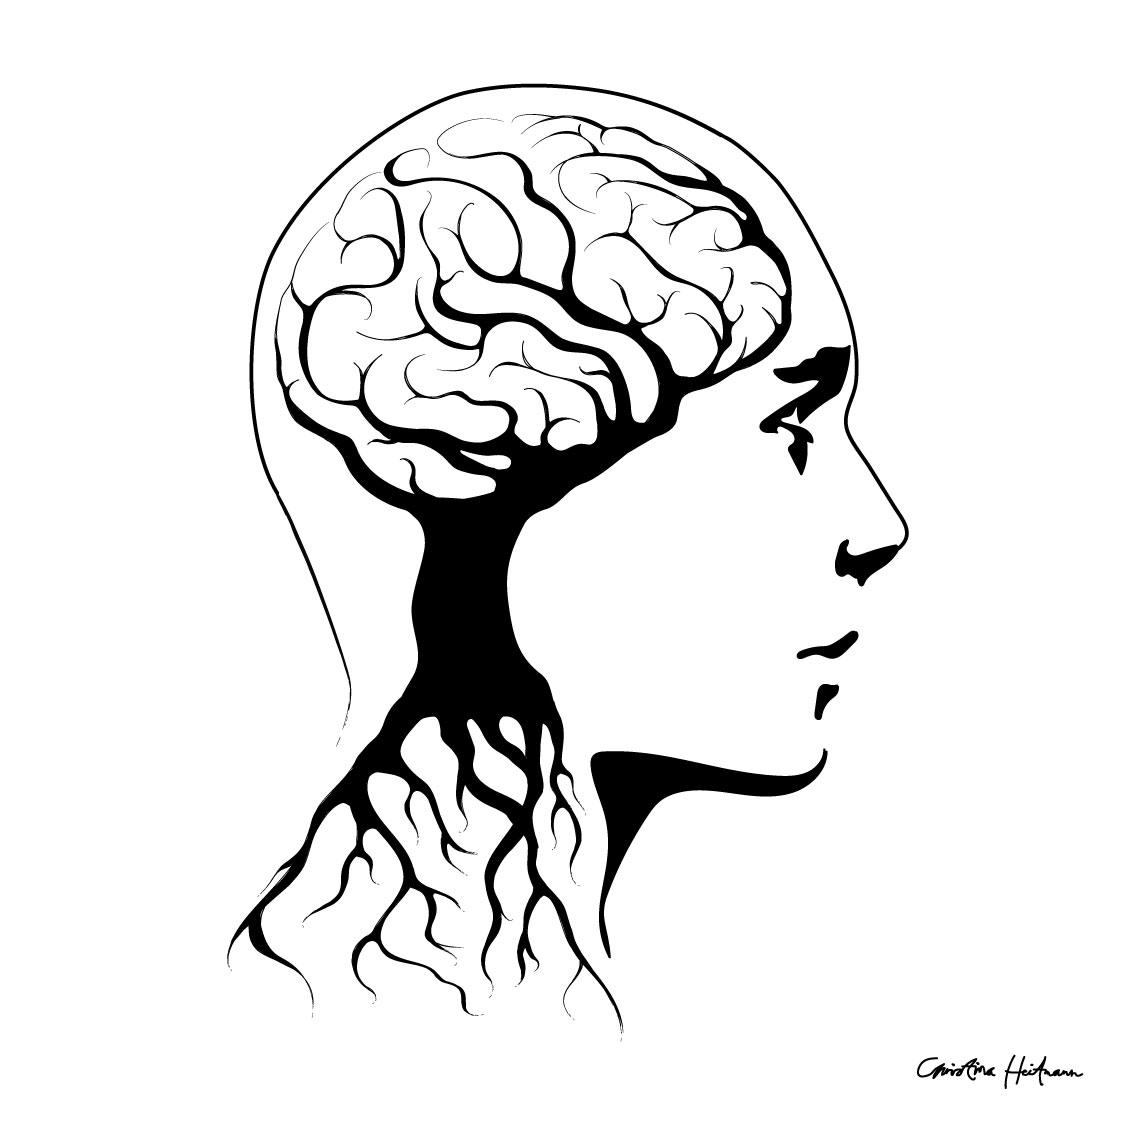 Kanslosmart-Hjarnan-och-nervsystemet-christina-heitmann.jpg